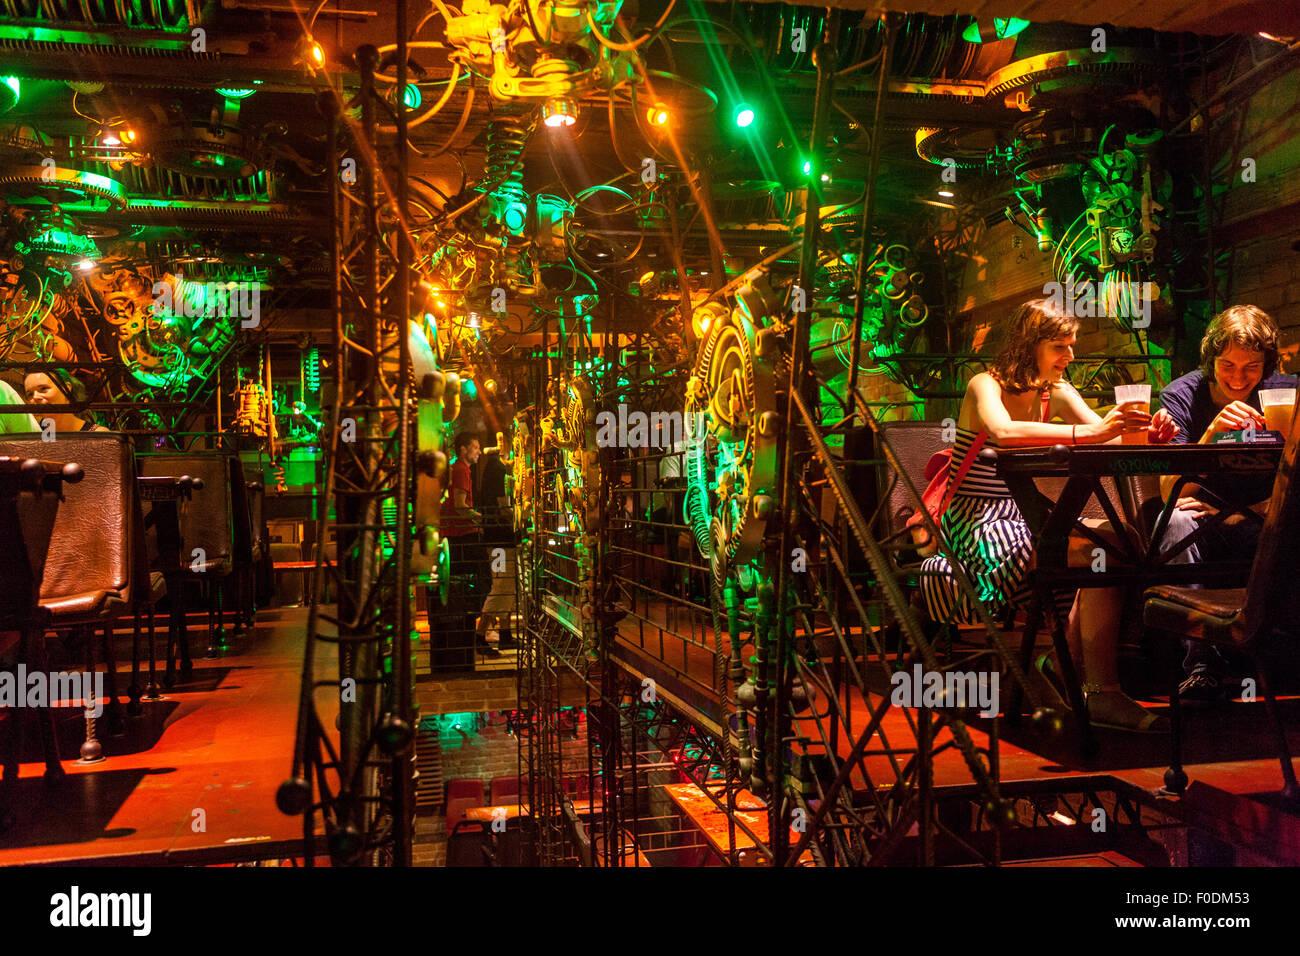 Cross Club Prag >> Cross Club, Favorite Music Club, Nightlife, Prague, Czech Republic Stock Photo, Royalty Free ...